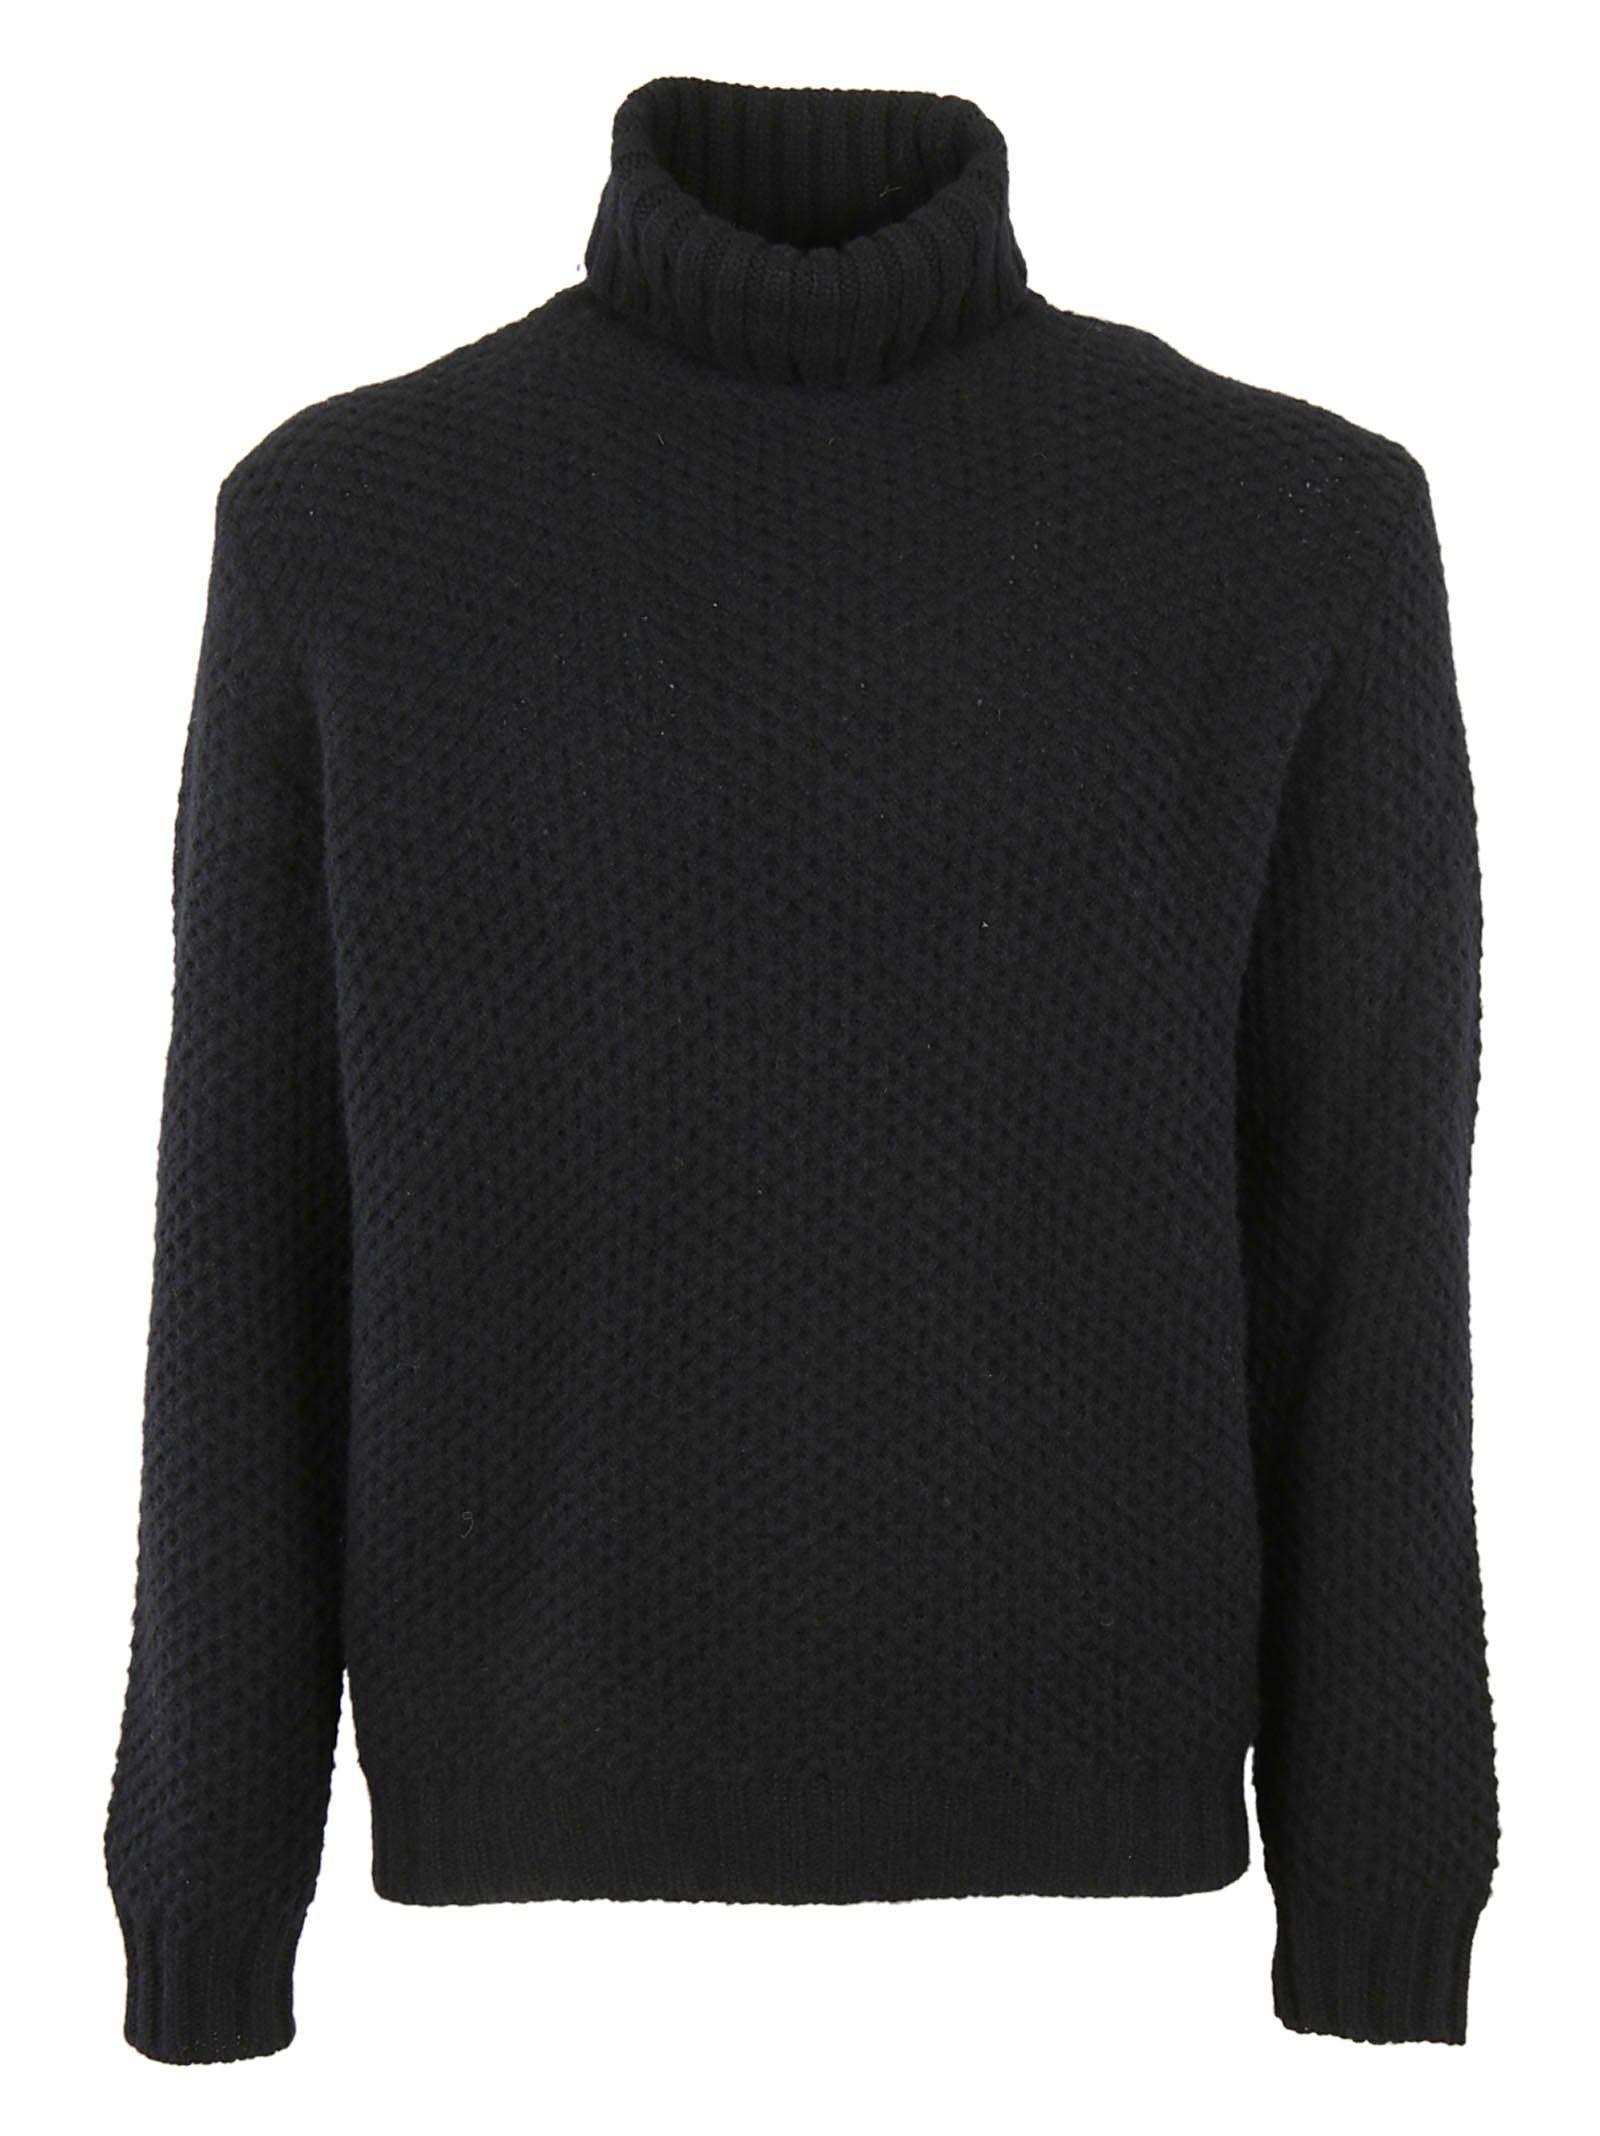 Massimo Piombo Turtle Neck Sweater